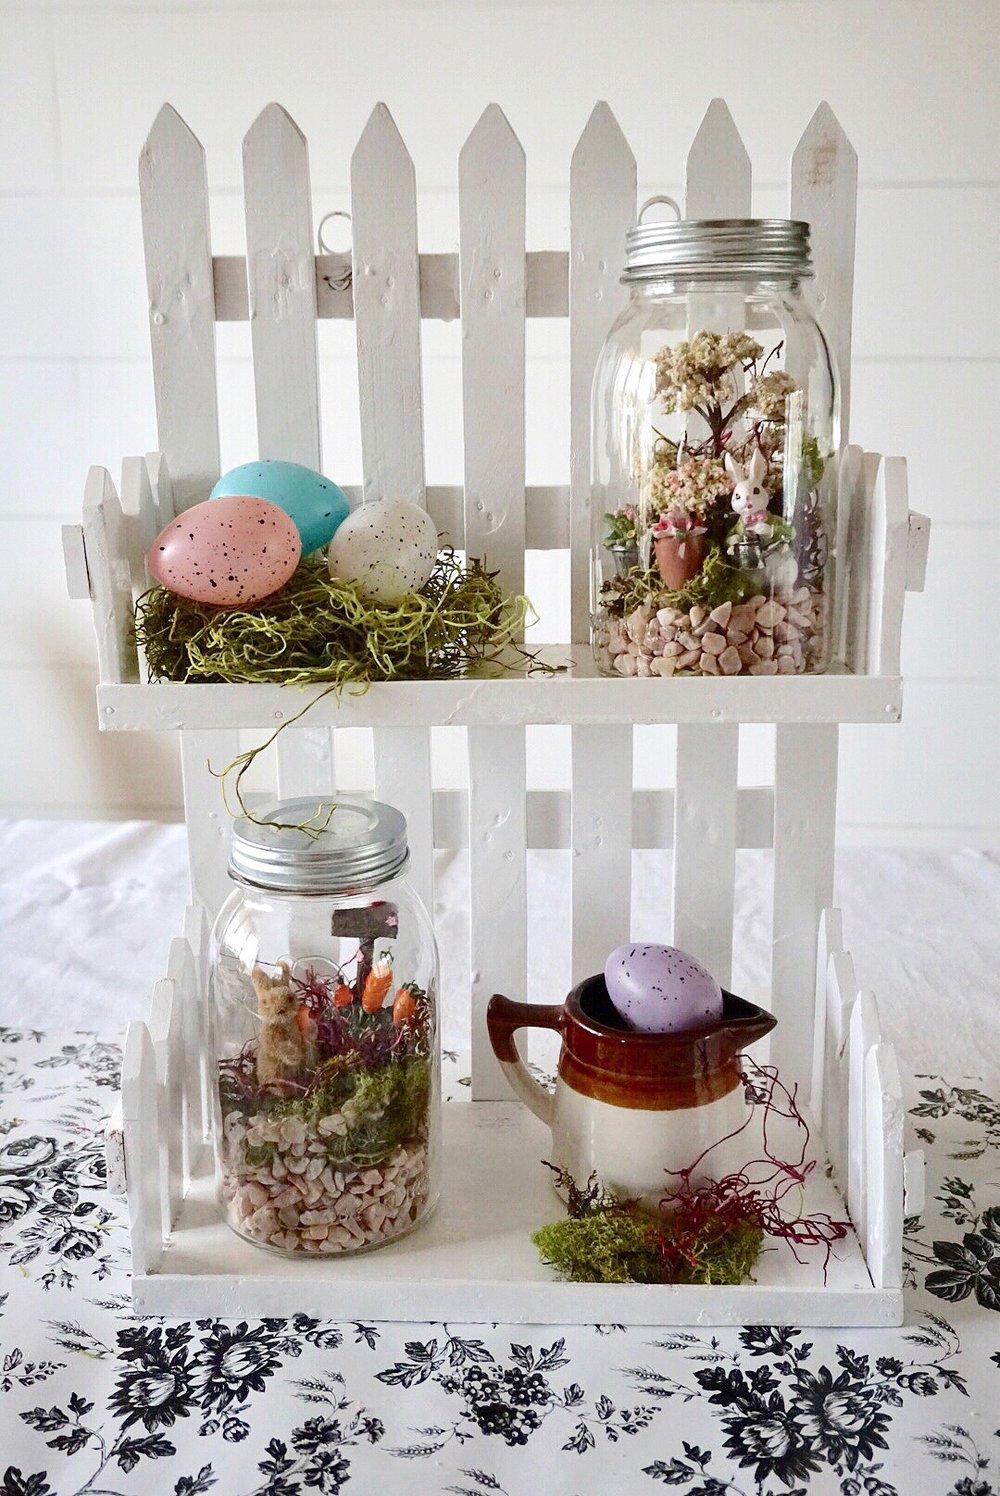 DIY Mason Jar Easter Fairy Garden Terrariums make great Easter host gifts or home decor.